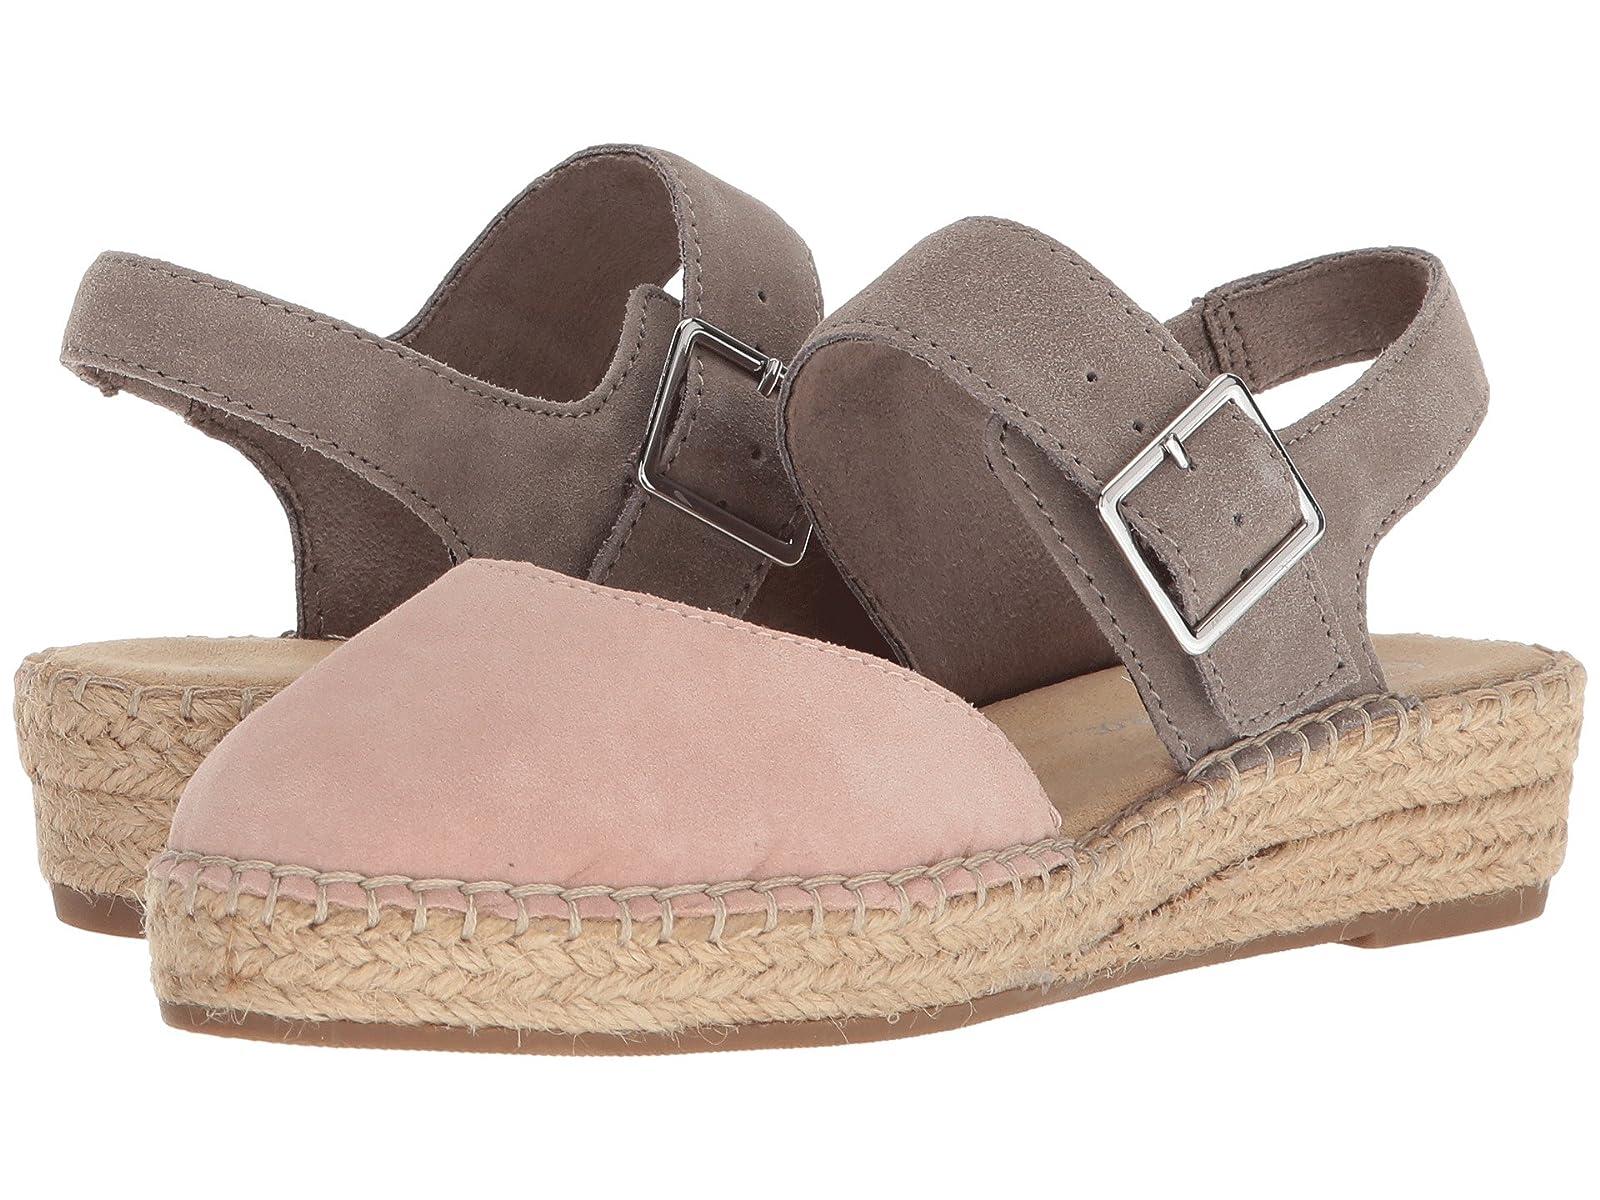 Bella-Vita CaralynnCheap and distinctive eye-catching shoes